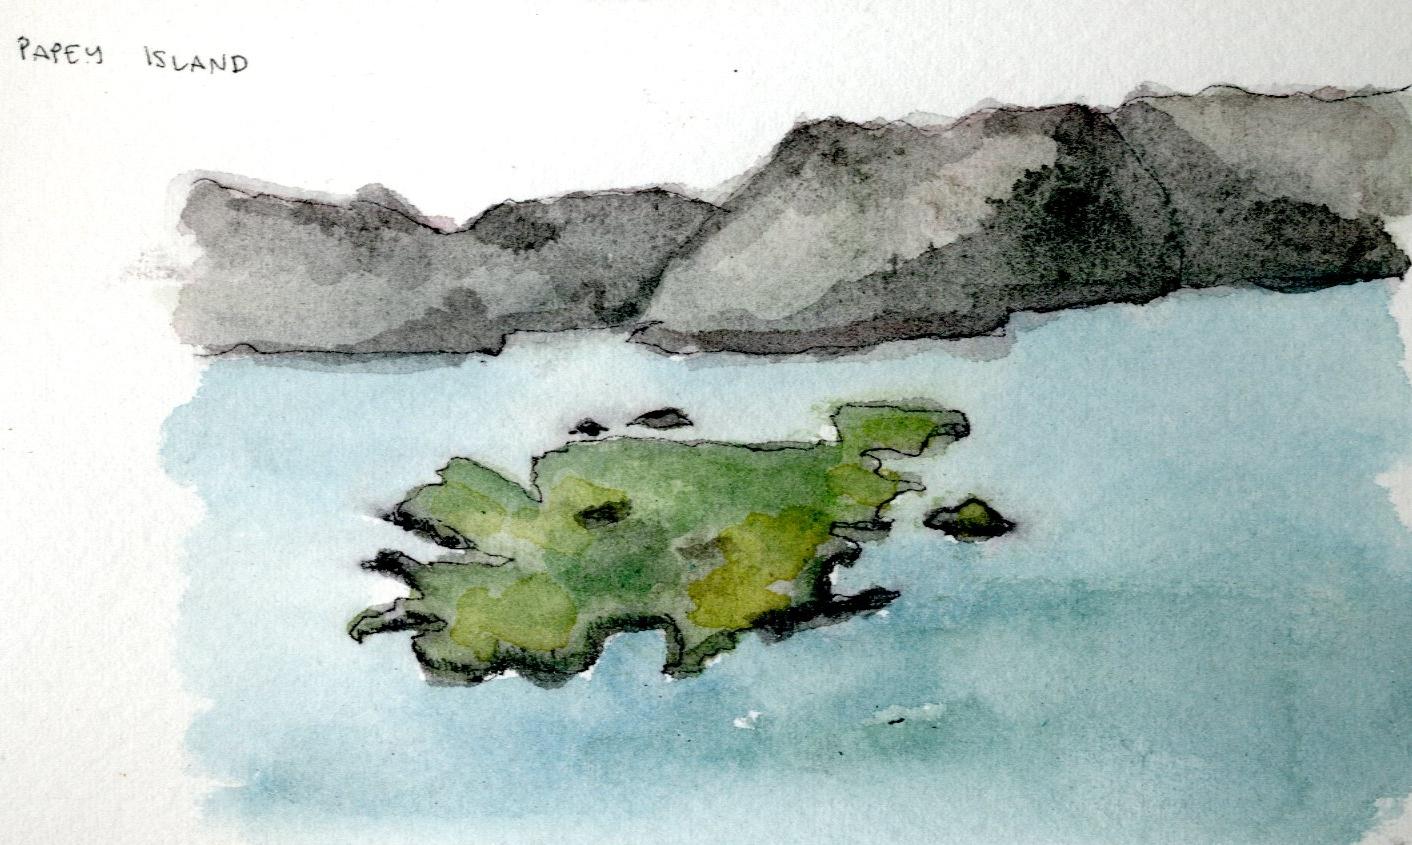 Papey Island.jpg